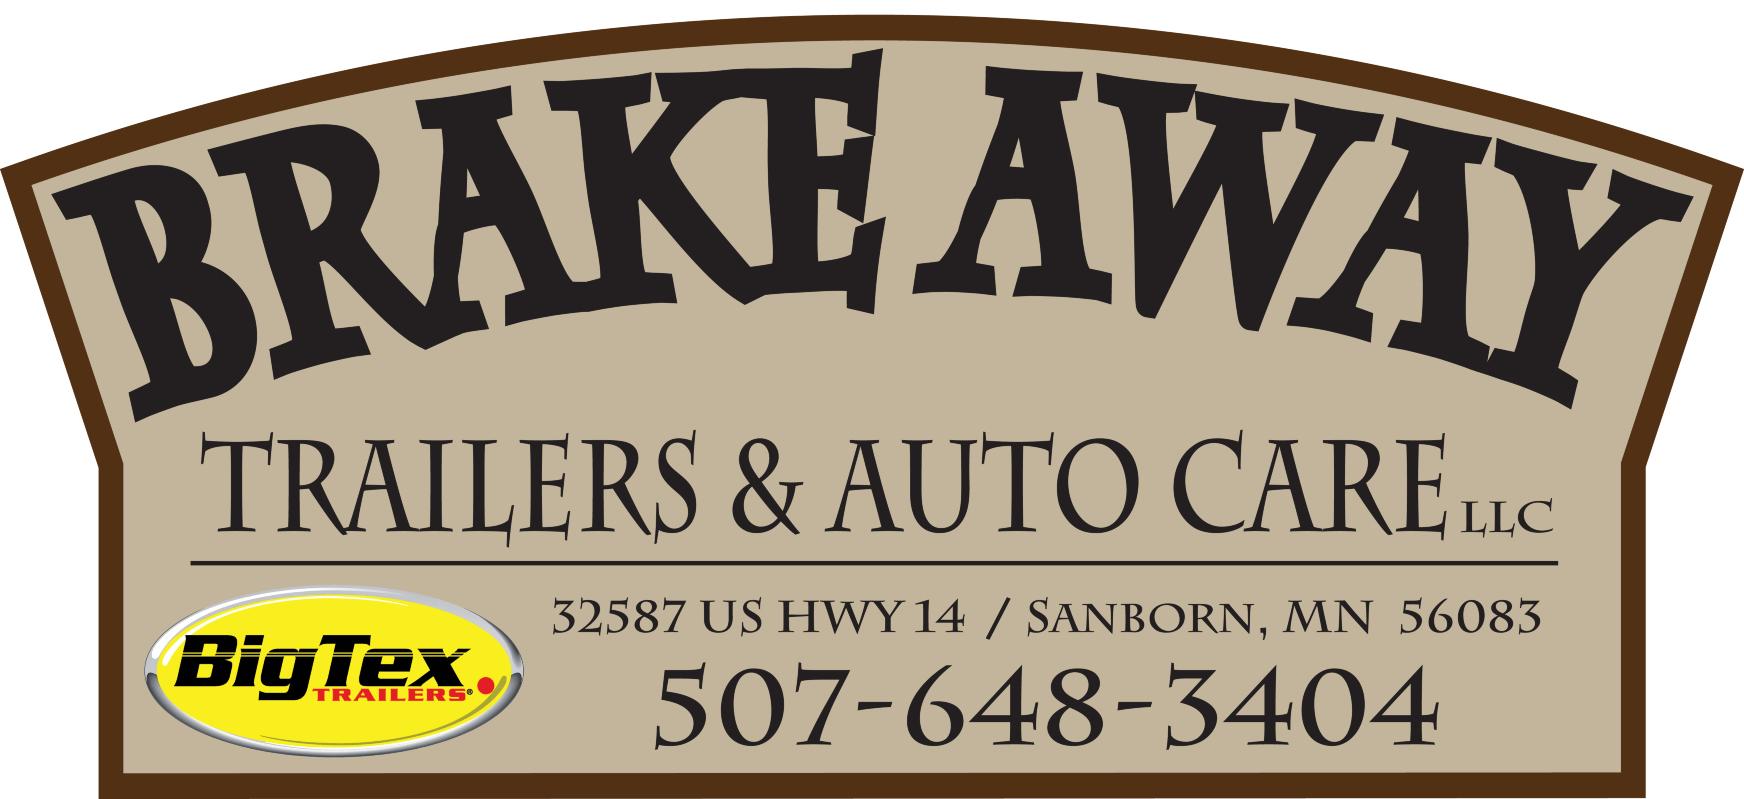 Brake Away Trailers & Auto Care, LLC